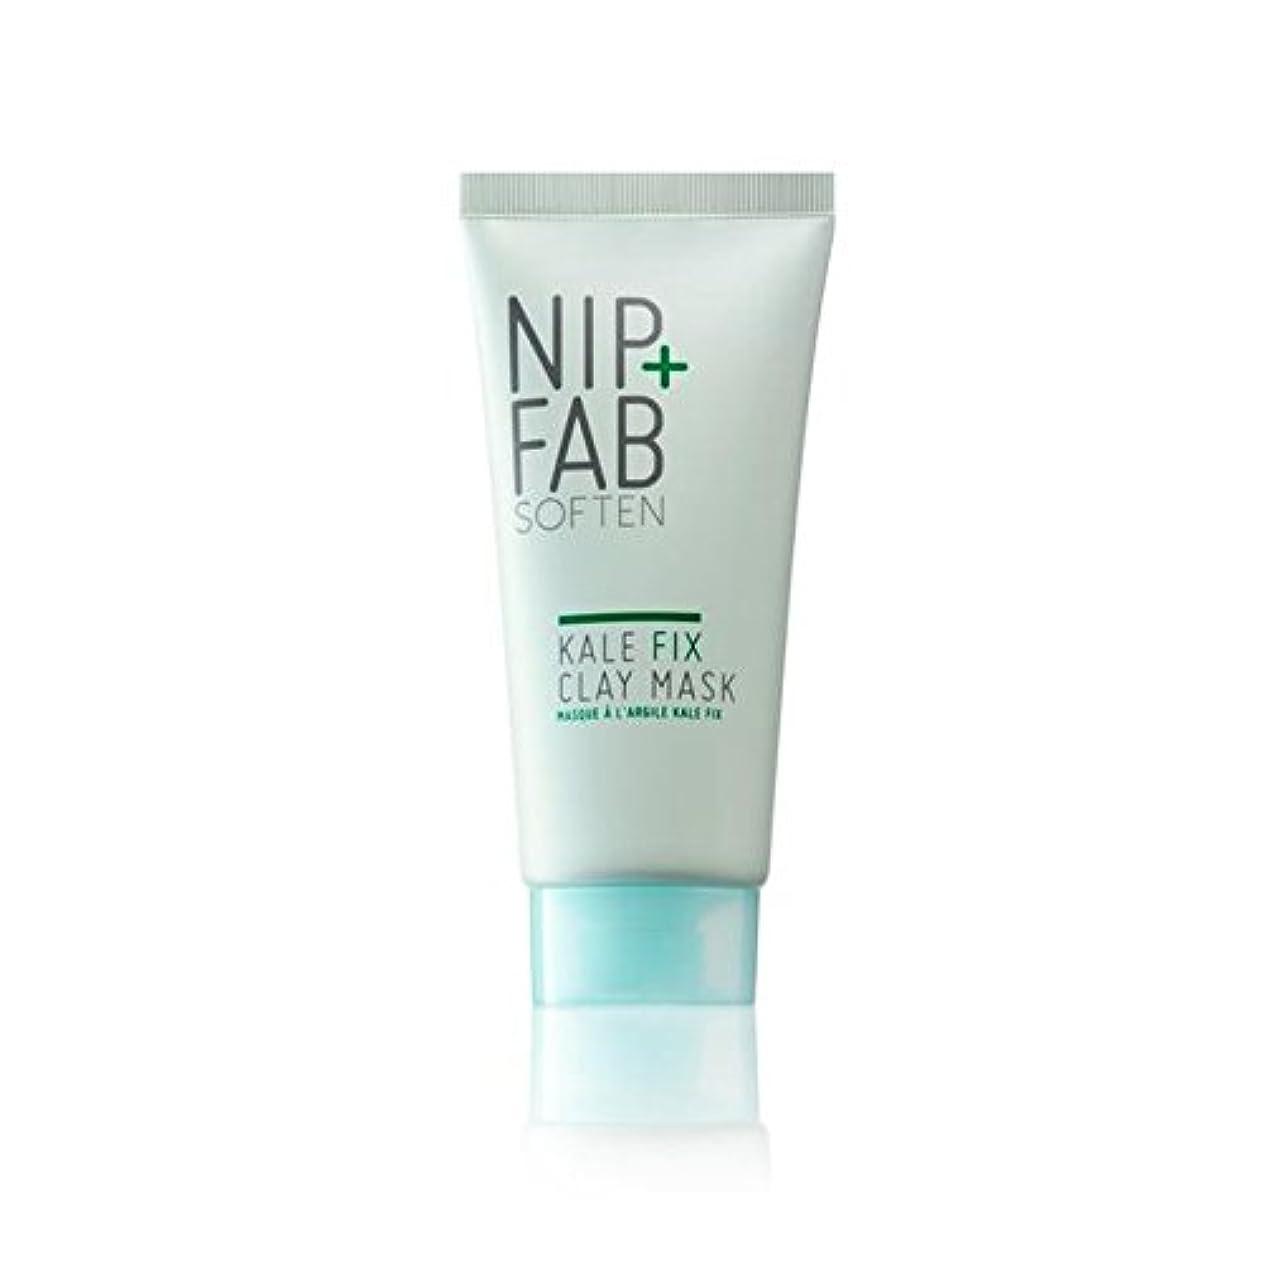 Nip+Fab Kale Fix Clay Mask 50ml (Pack of 6) - + ケール修正クレイマスク50ミリリットルニップ x6 [並行輸入品]